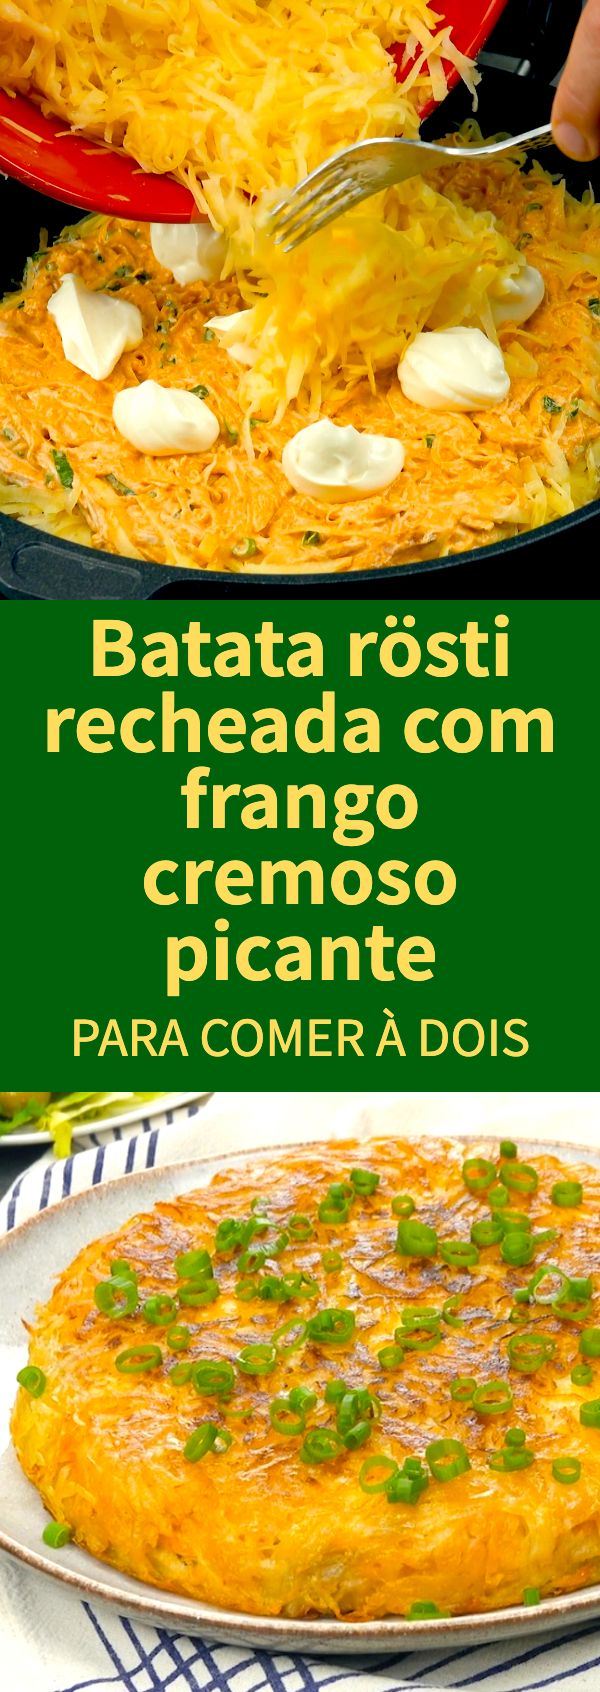 Batata rösti recheada com frango cremoso picante #batata #batatarosti #receitadebatatarosti #frangopicante #batatarecheada #batatarostirecheada